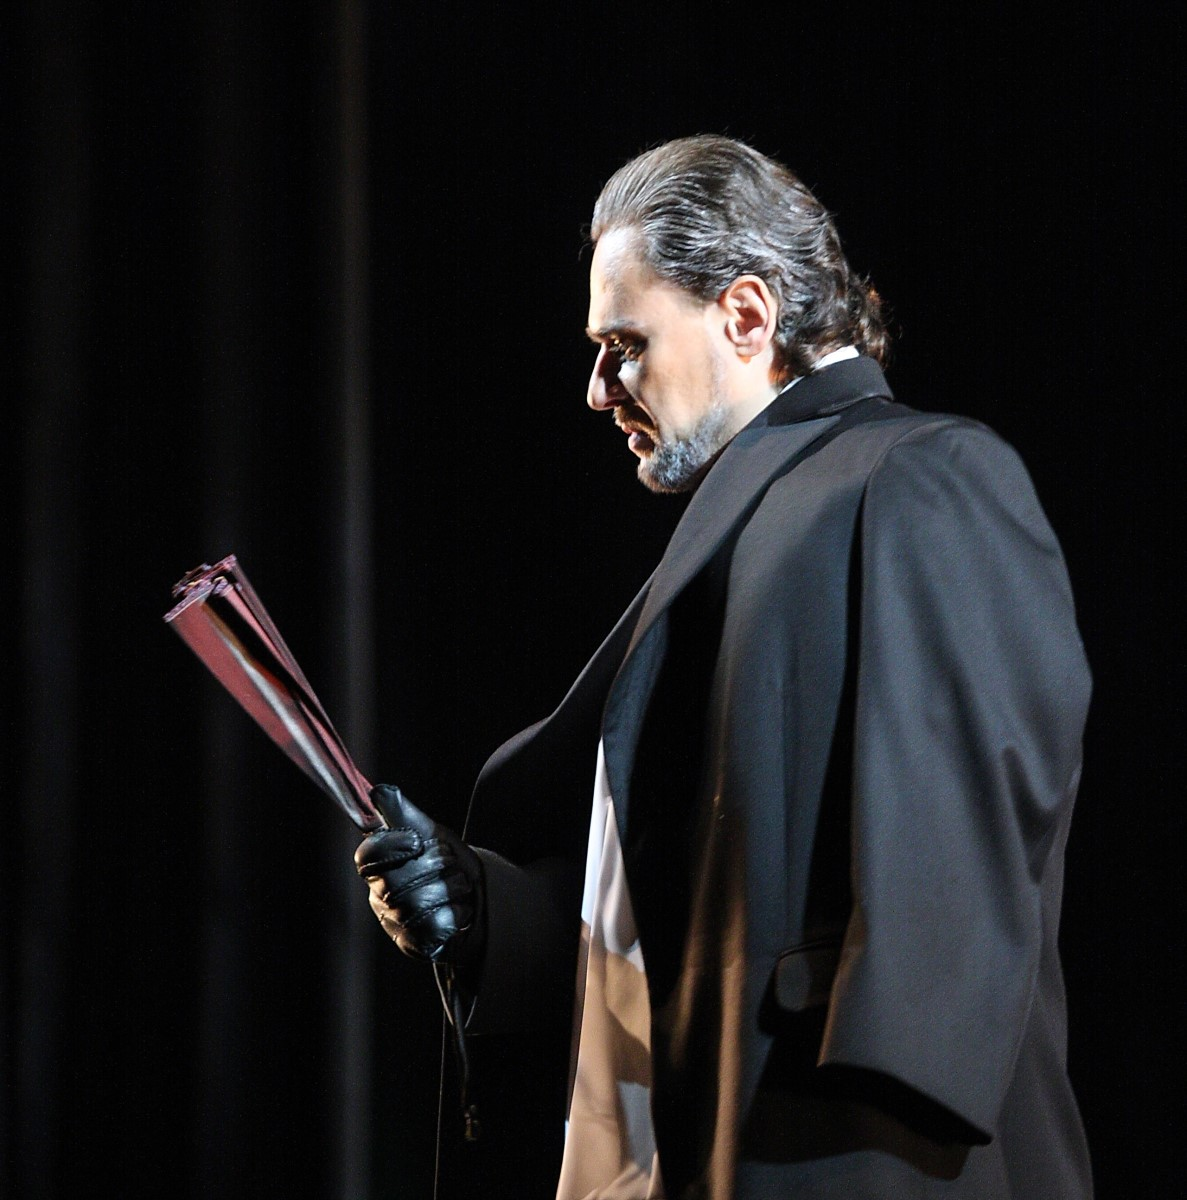 Снимка: ТОСКА от Джакомо Пучини / TOSCA by Giacomo Puccini